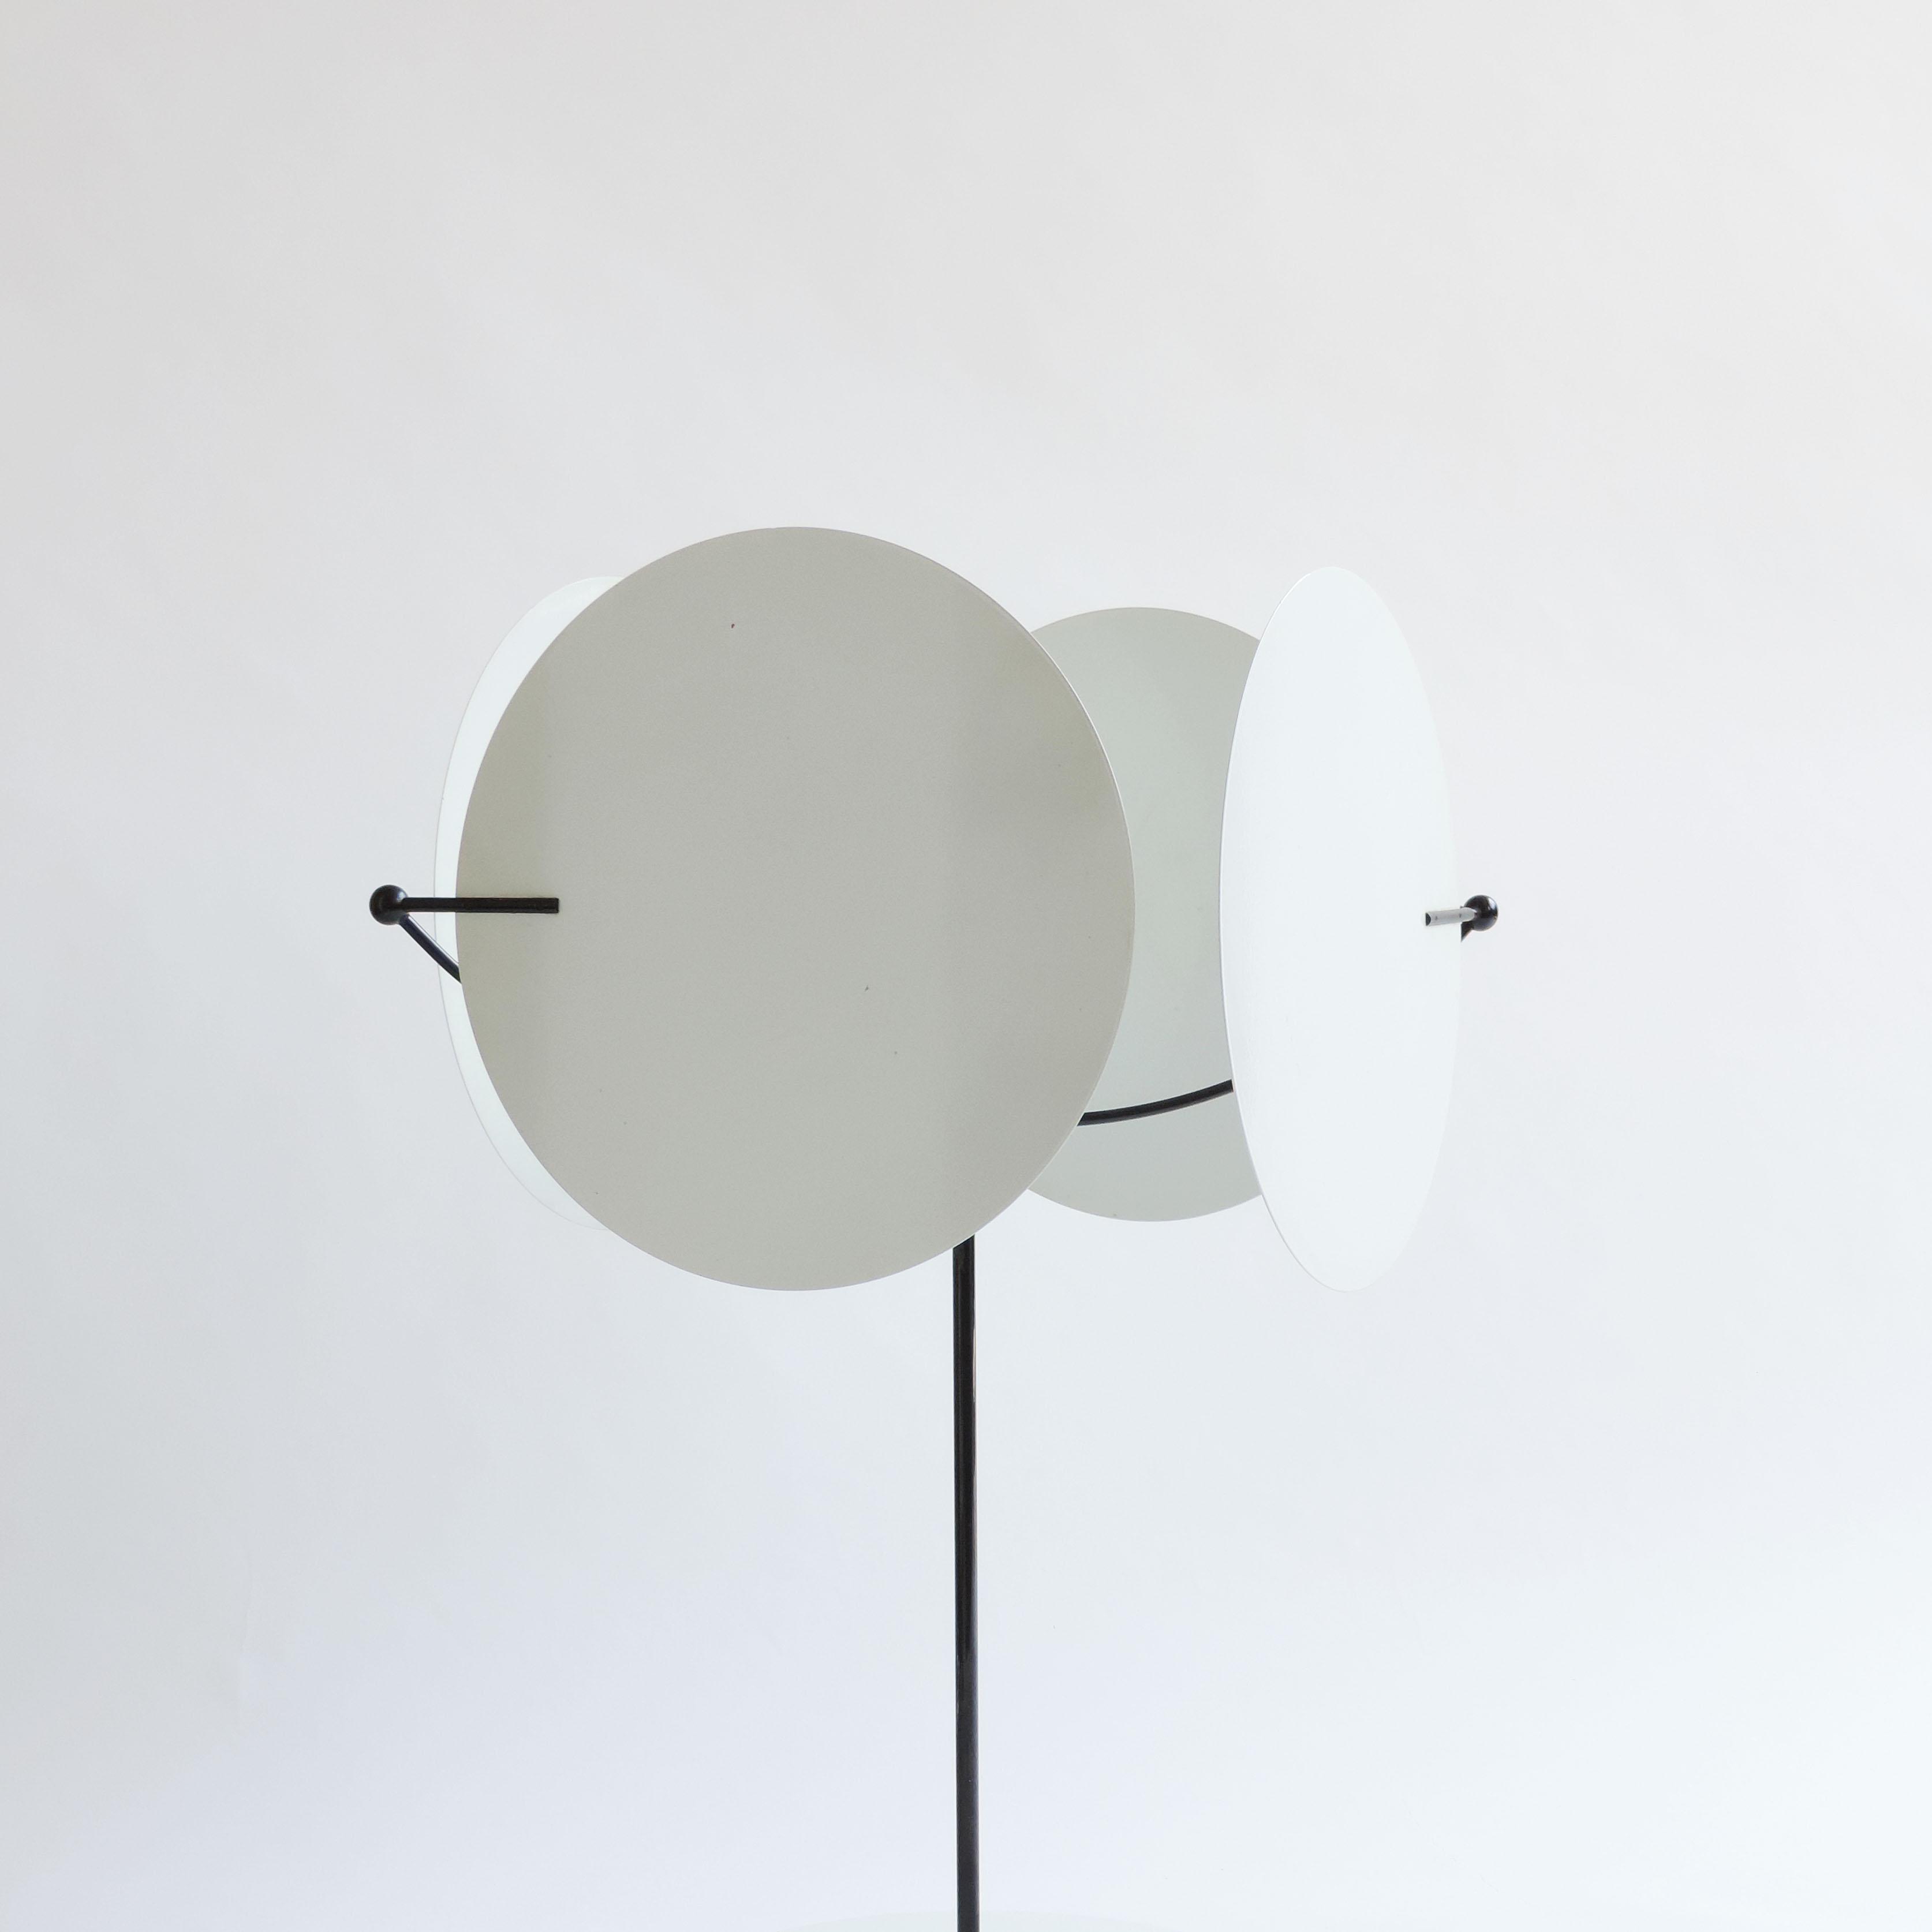 vico magistretti, oluce, design masters, modernariato, italian lighting